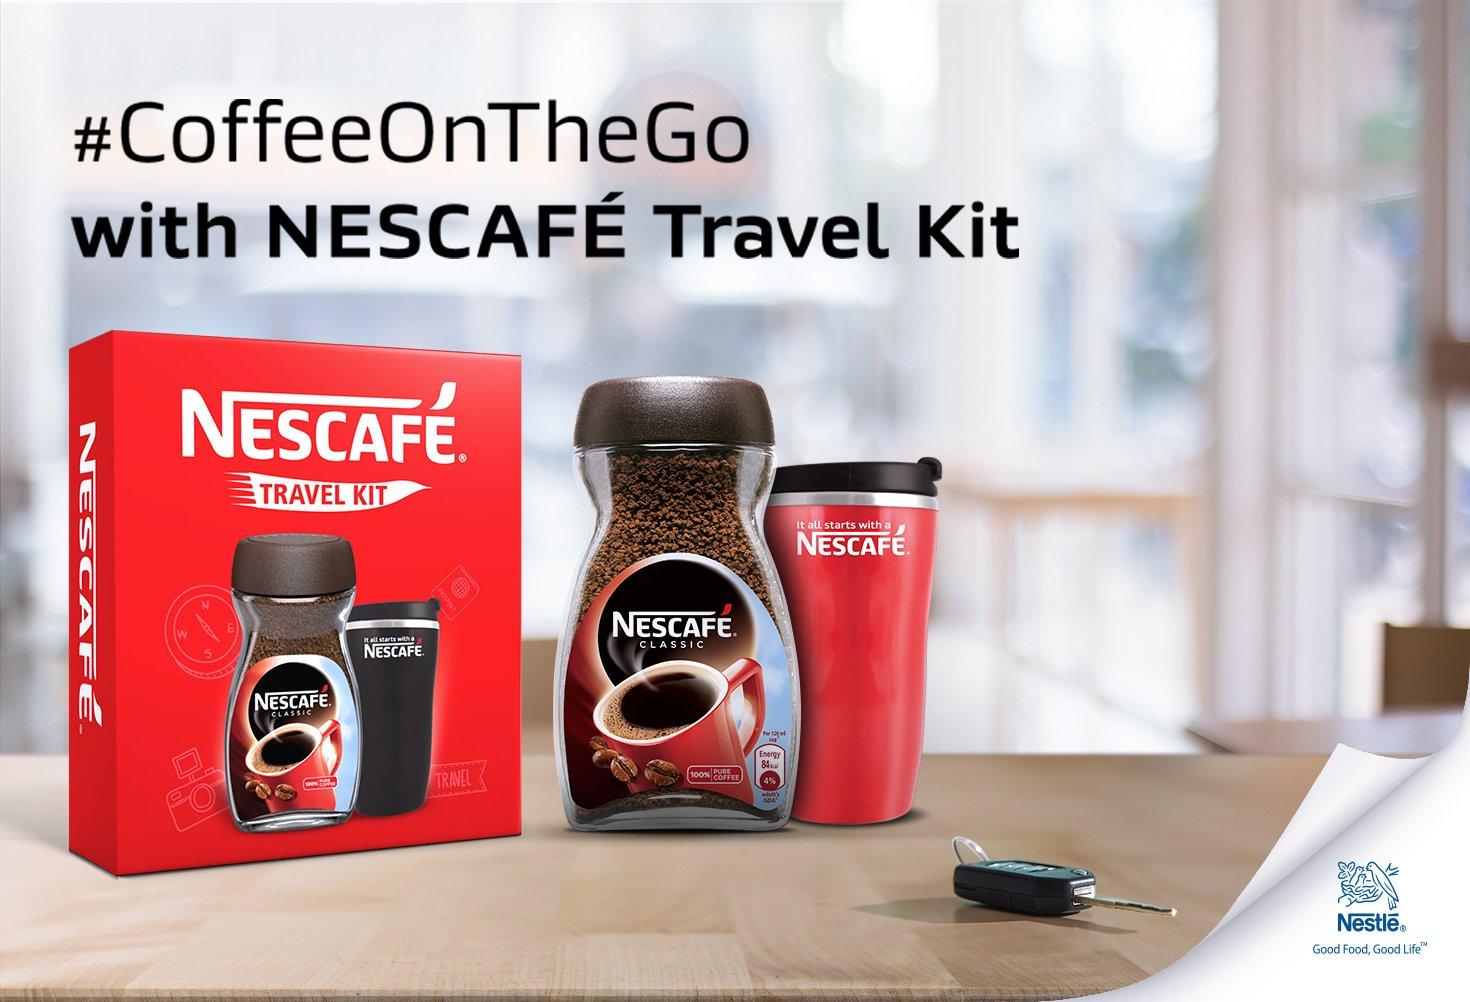 Nescafe travel kit